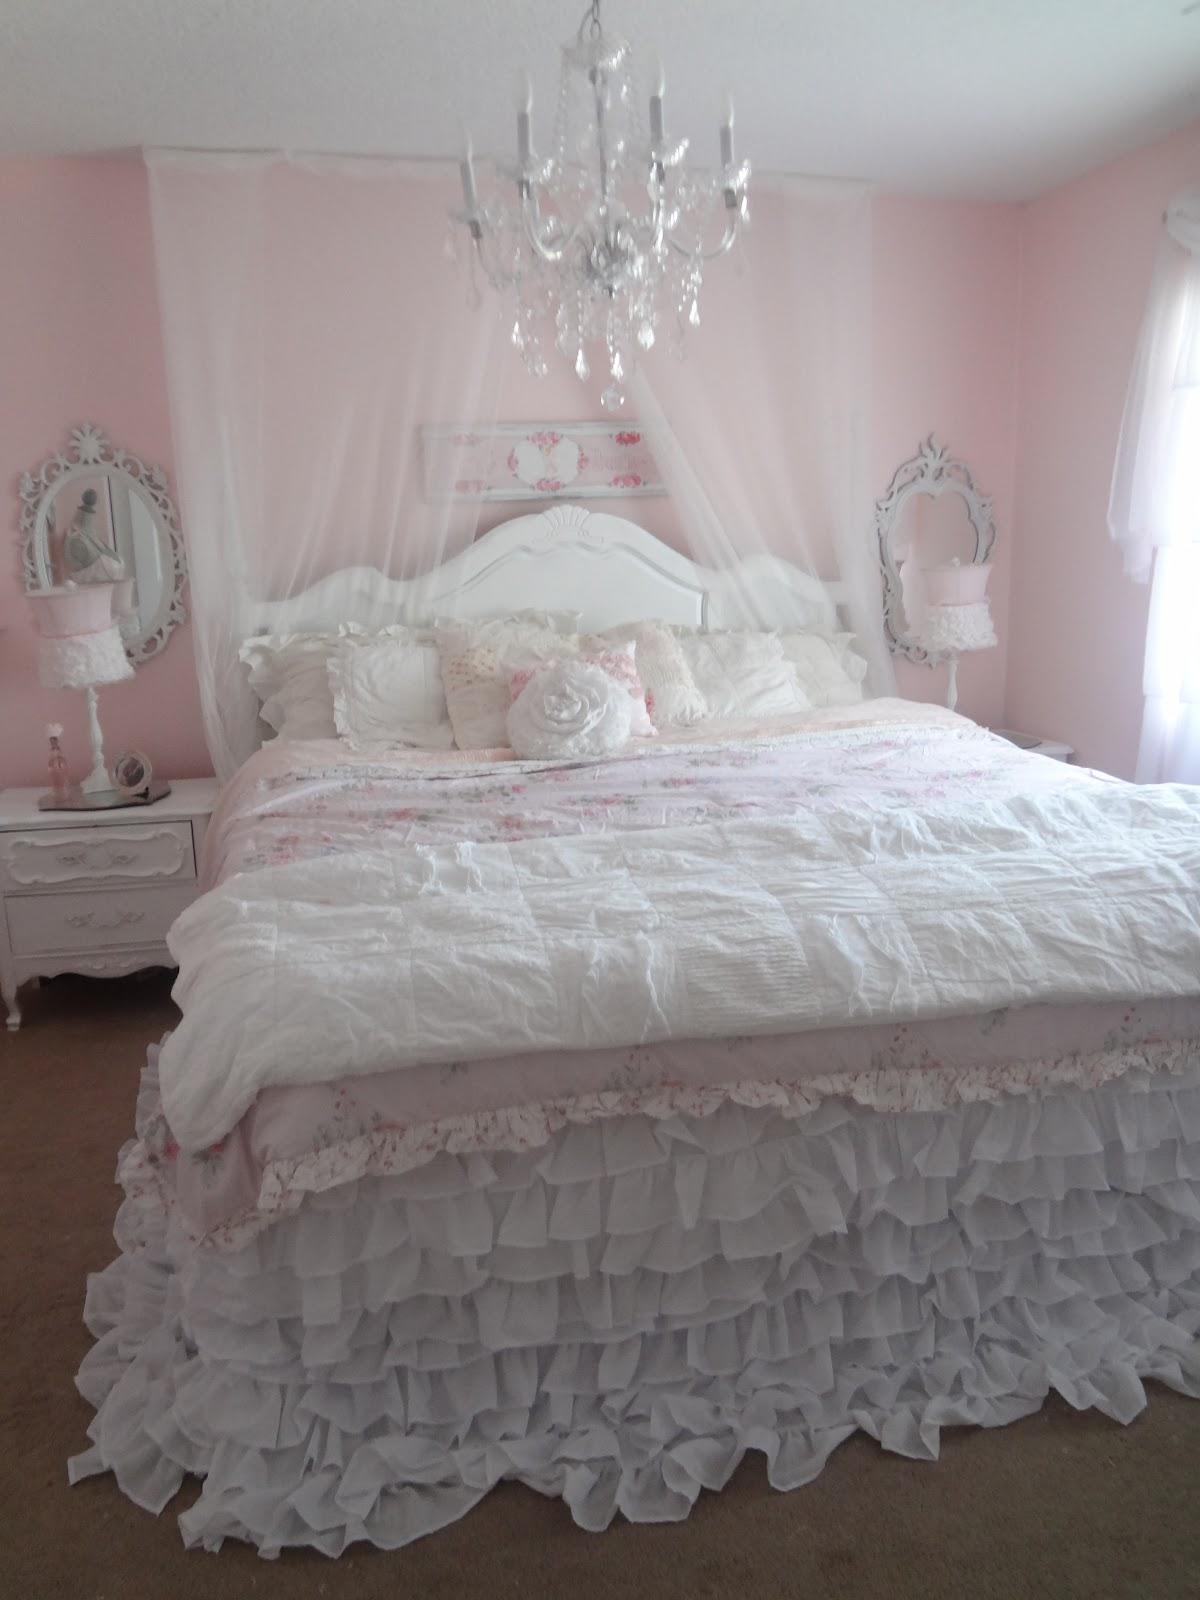 Not so shabby shabby chic my new ruffly bedding - What is shabby chic ...